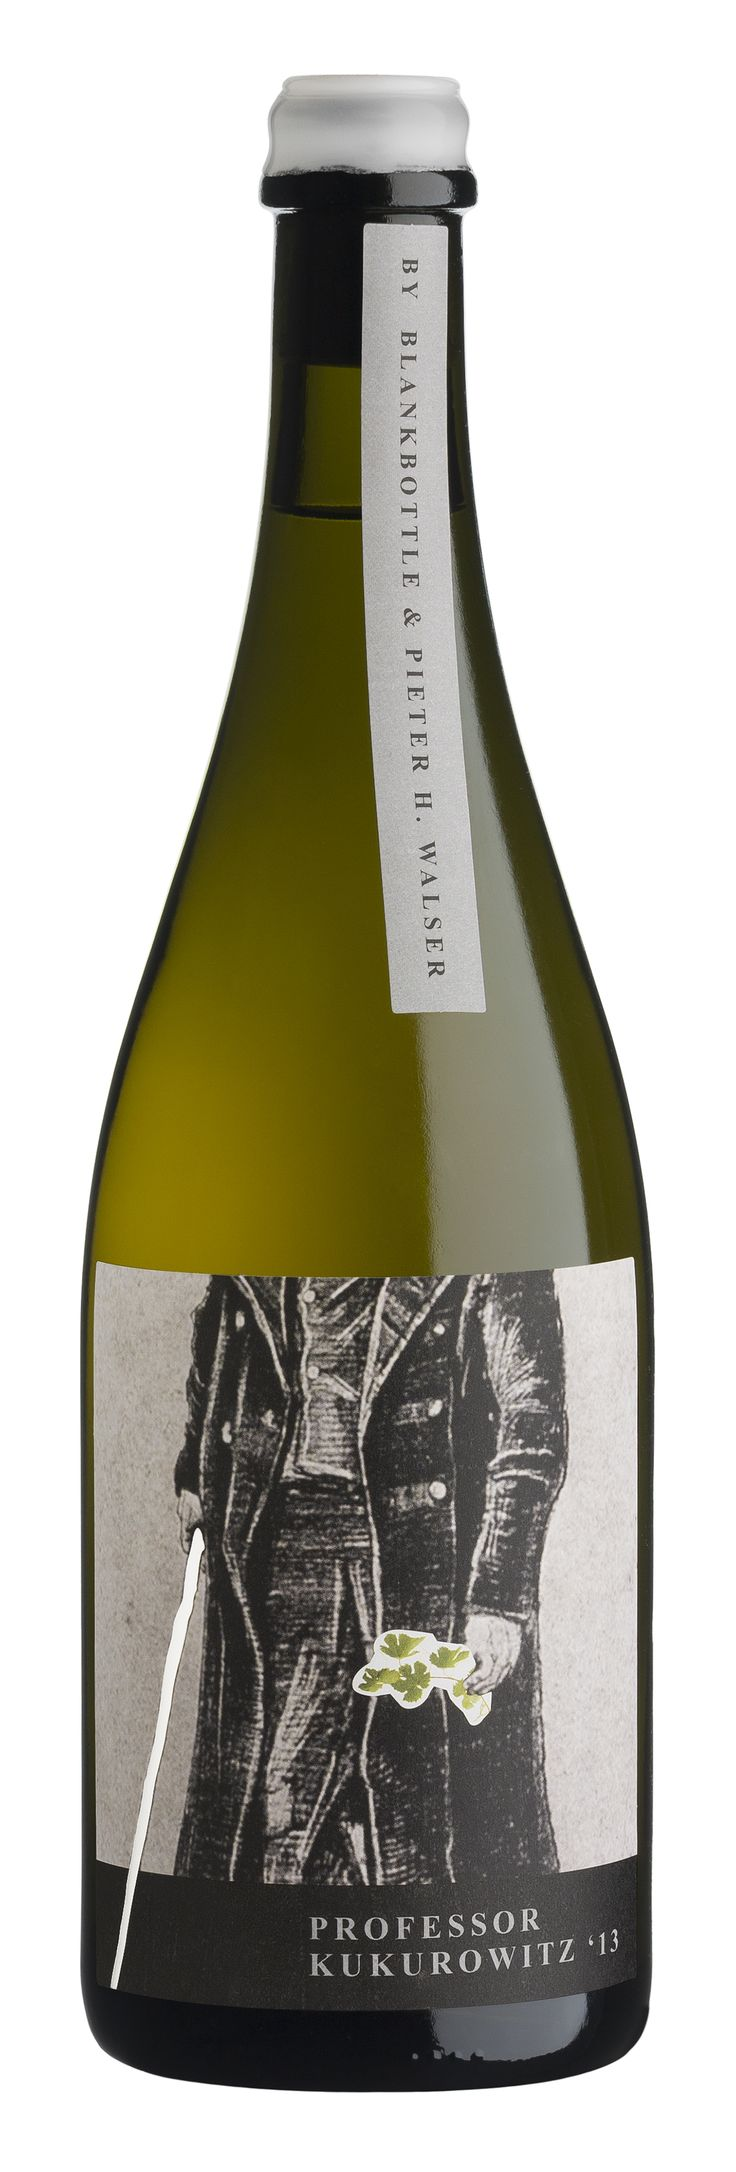 BLANKbottle Wines - Professor KUKUROWITZ 2013 #wine #packaging #SouthAfrica